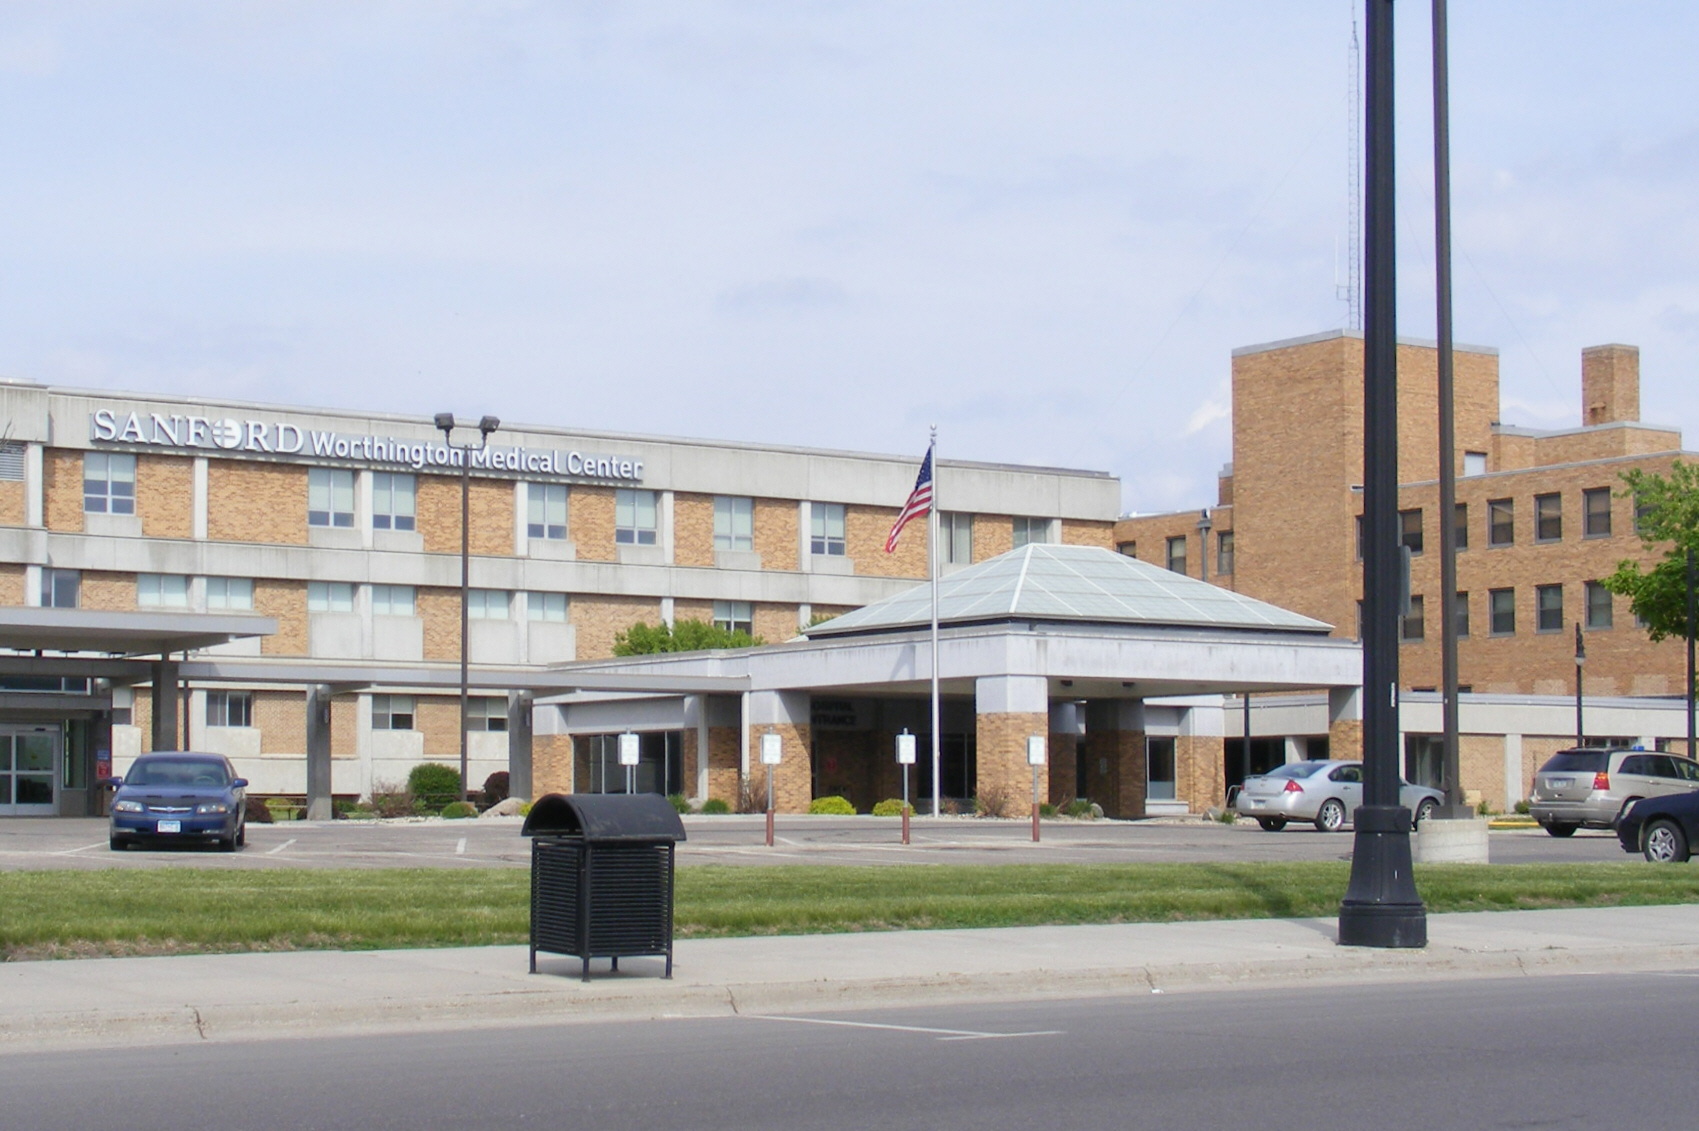 Crossroads Care Center Worthington Mn 56187